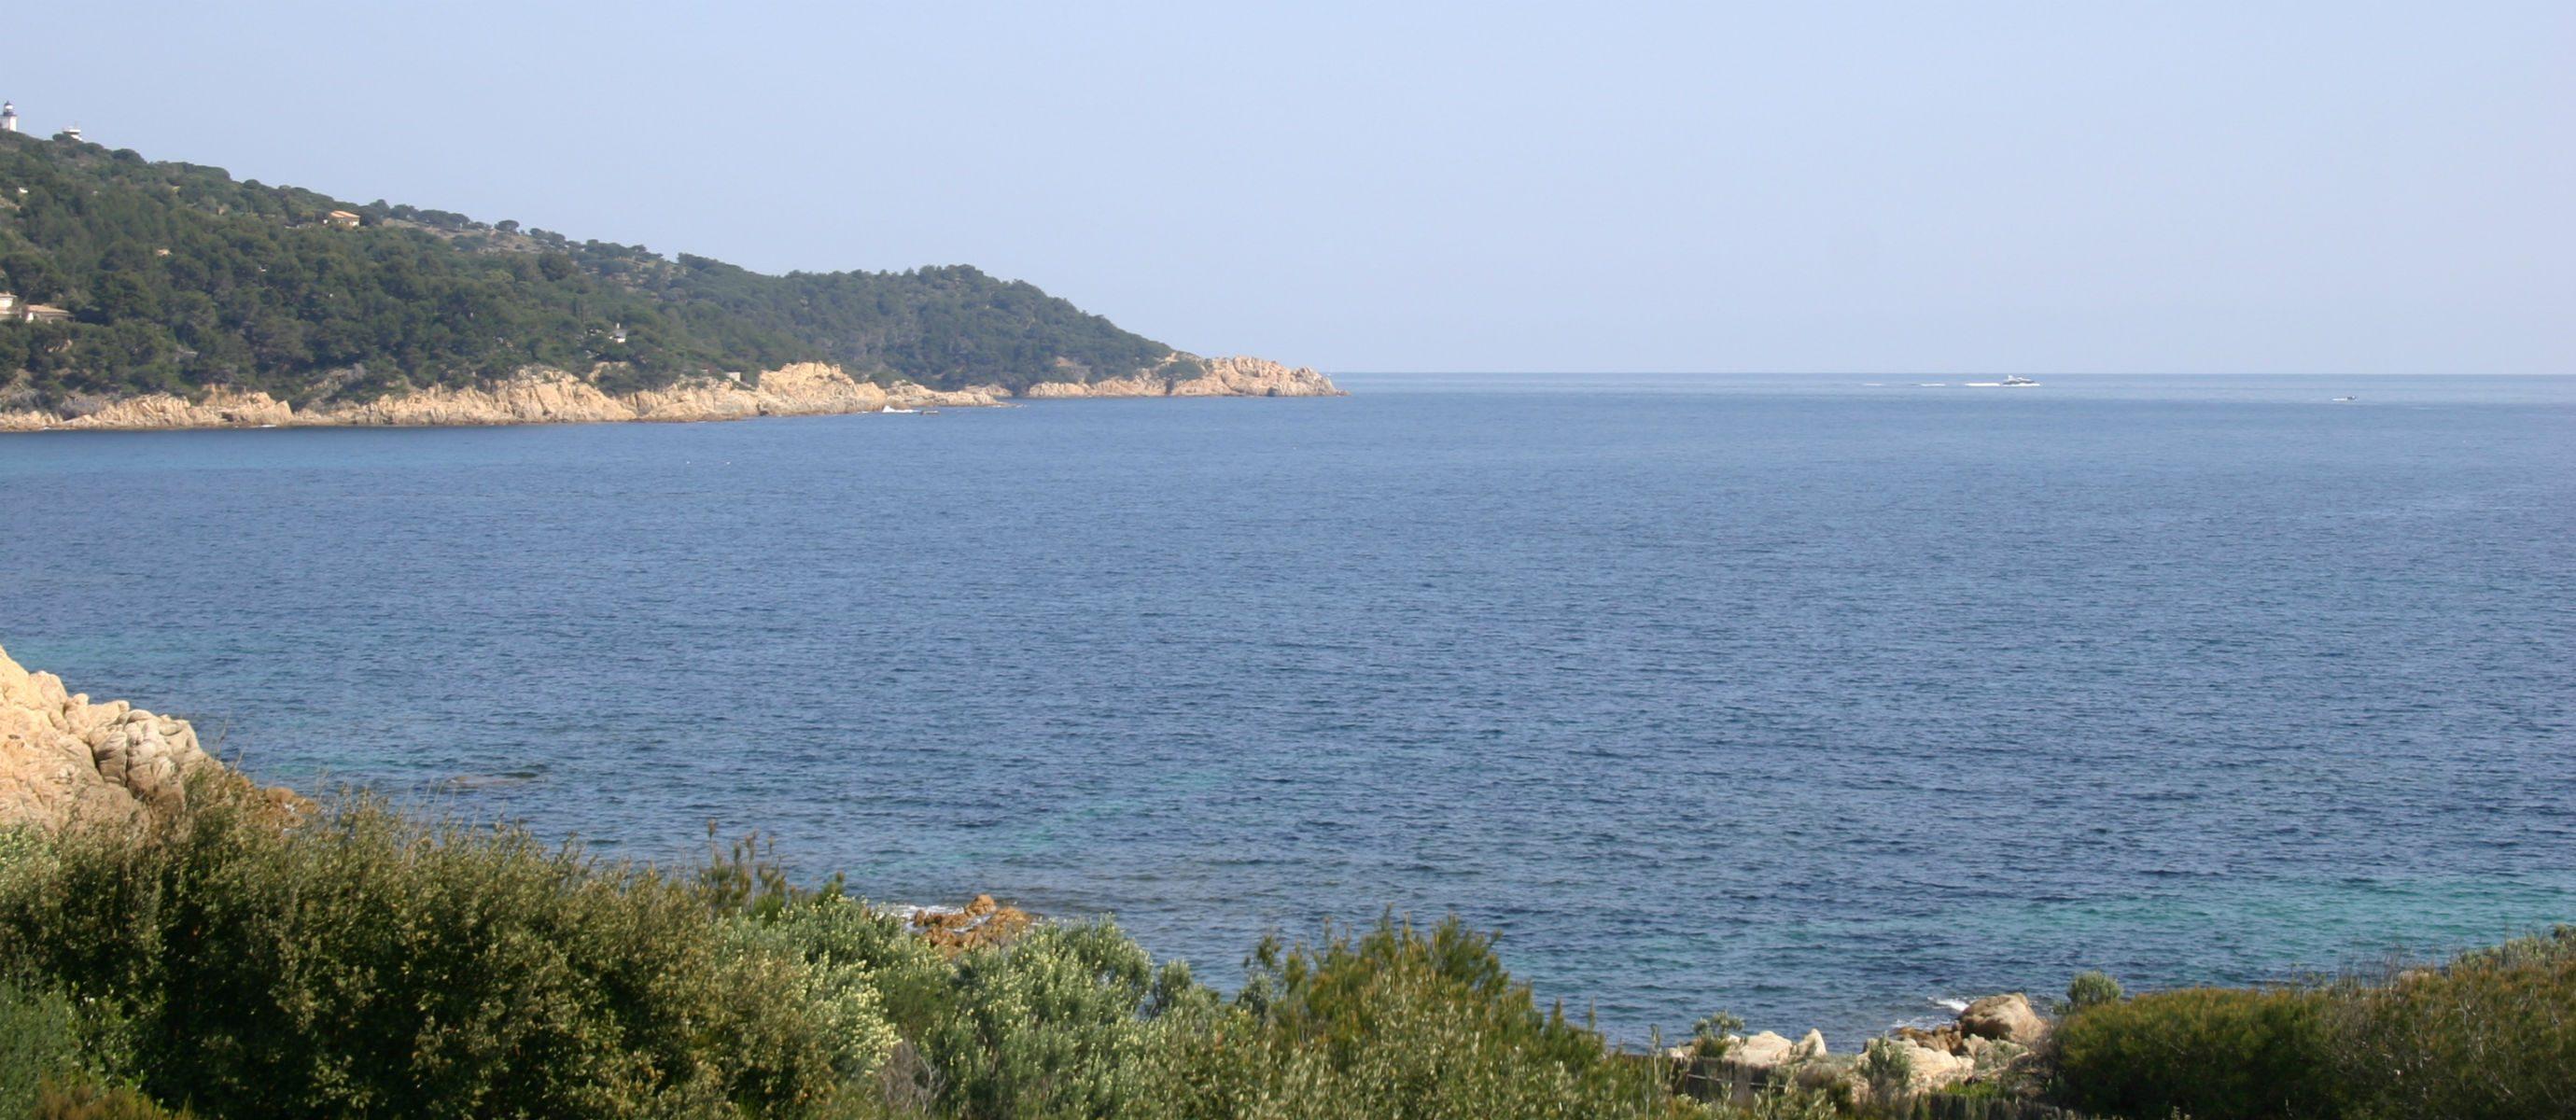 Mediterranean HorizonP15